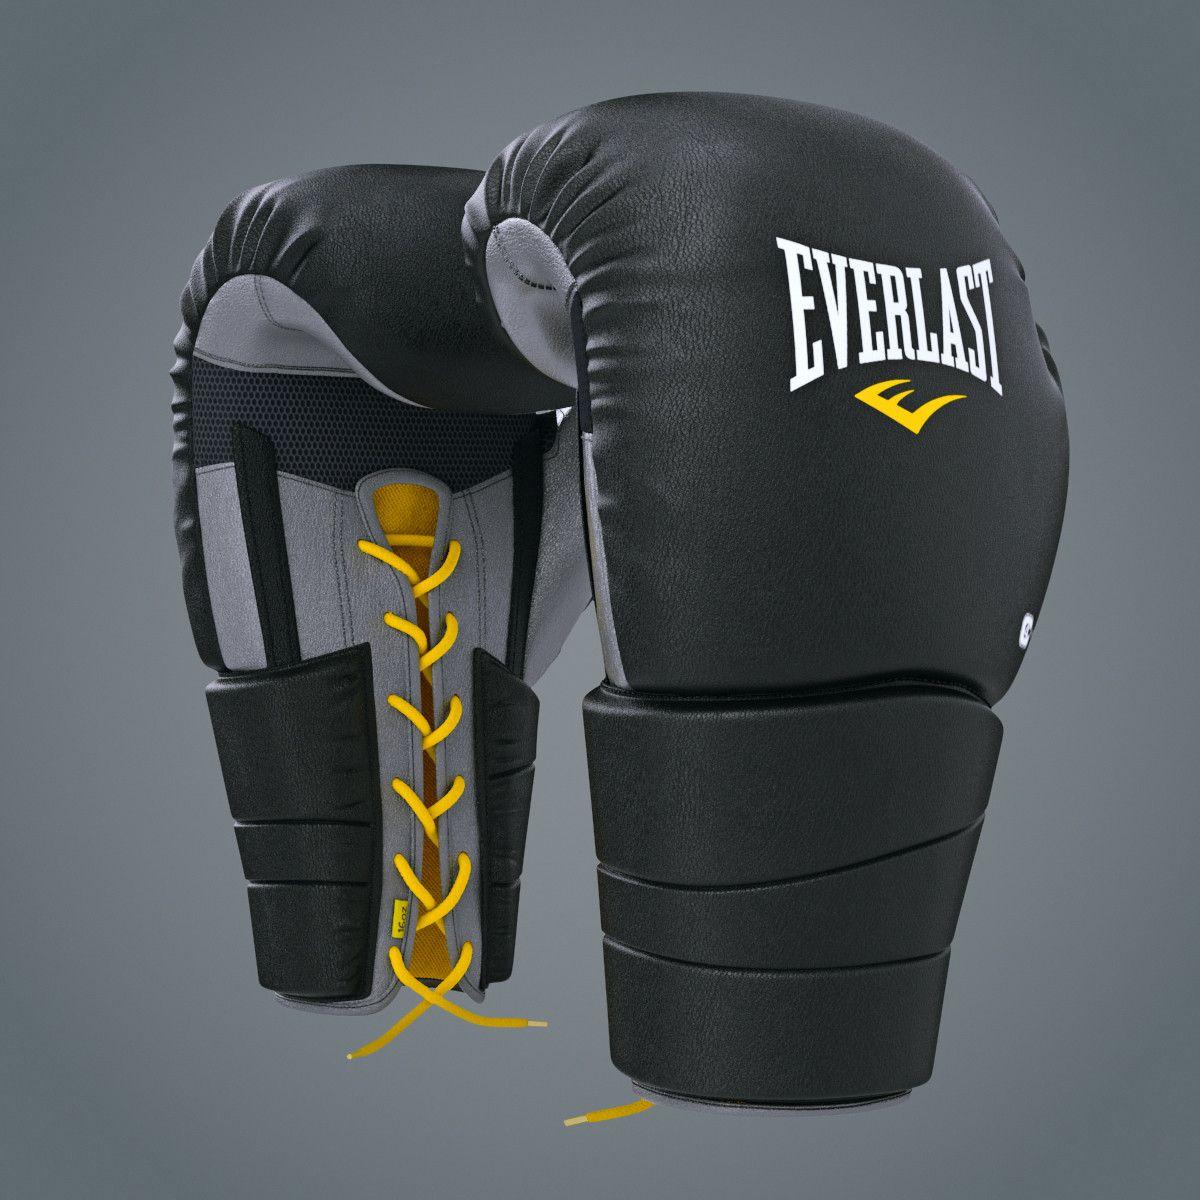 Everlast Boxing Prime Training Glove ISOPLATE Tech MMA Mitt Bag Sparring 14//16oz